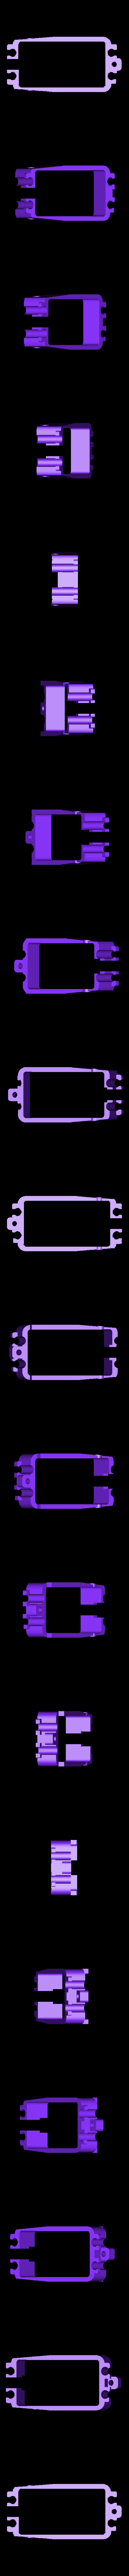 servo holder.stl Download free STL file Aryton Senna's Mclaren MP4/6 3d Printed RC F1 Car • 3D printing design, brett